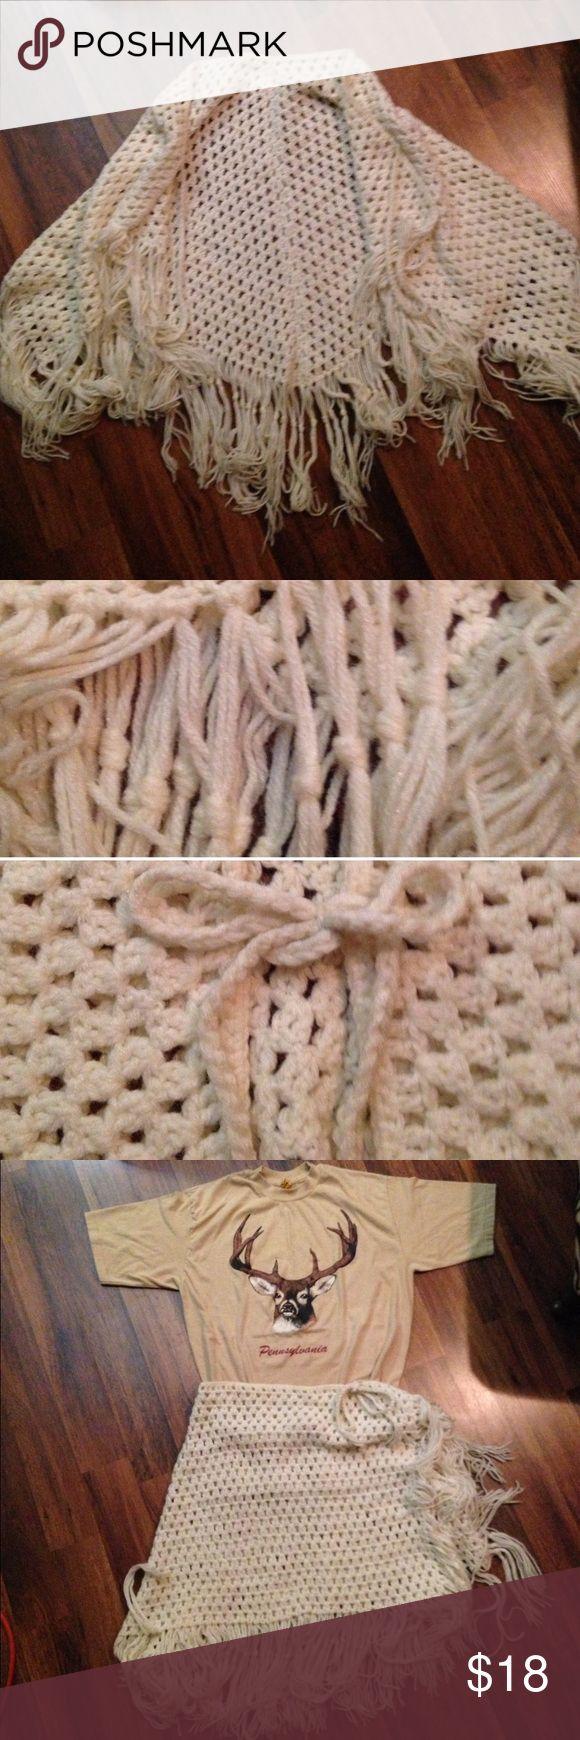 "Vintage Crochet Fringe Cape Vintage Crochet Cape. Knotted fringe. Braided front tie. Soft. 22"" x 40"". Cream color. Fringe 8 1/2"" long. Vintage Jackets & Coats Capes"